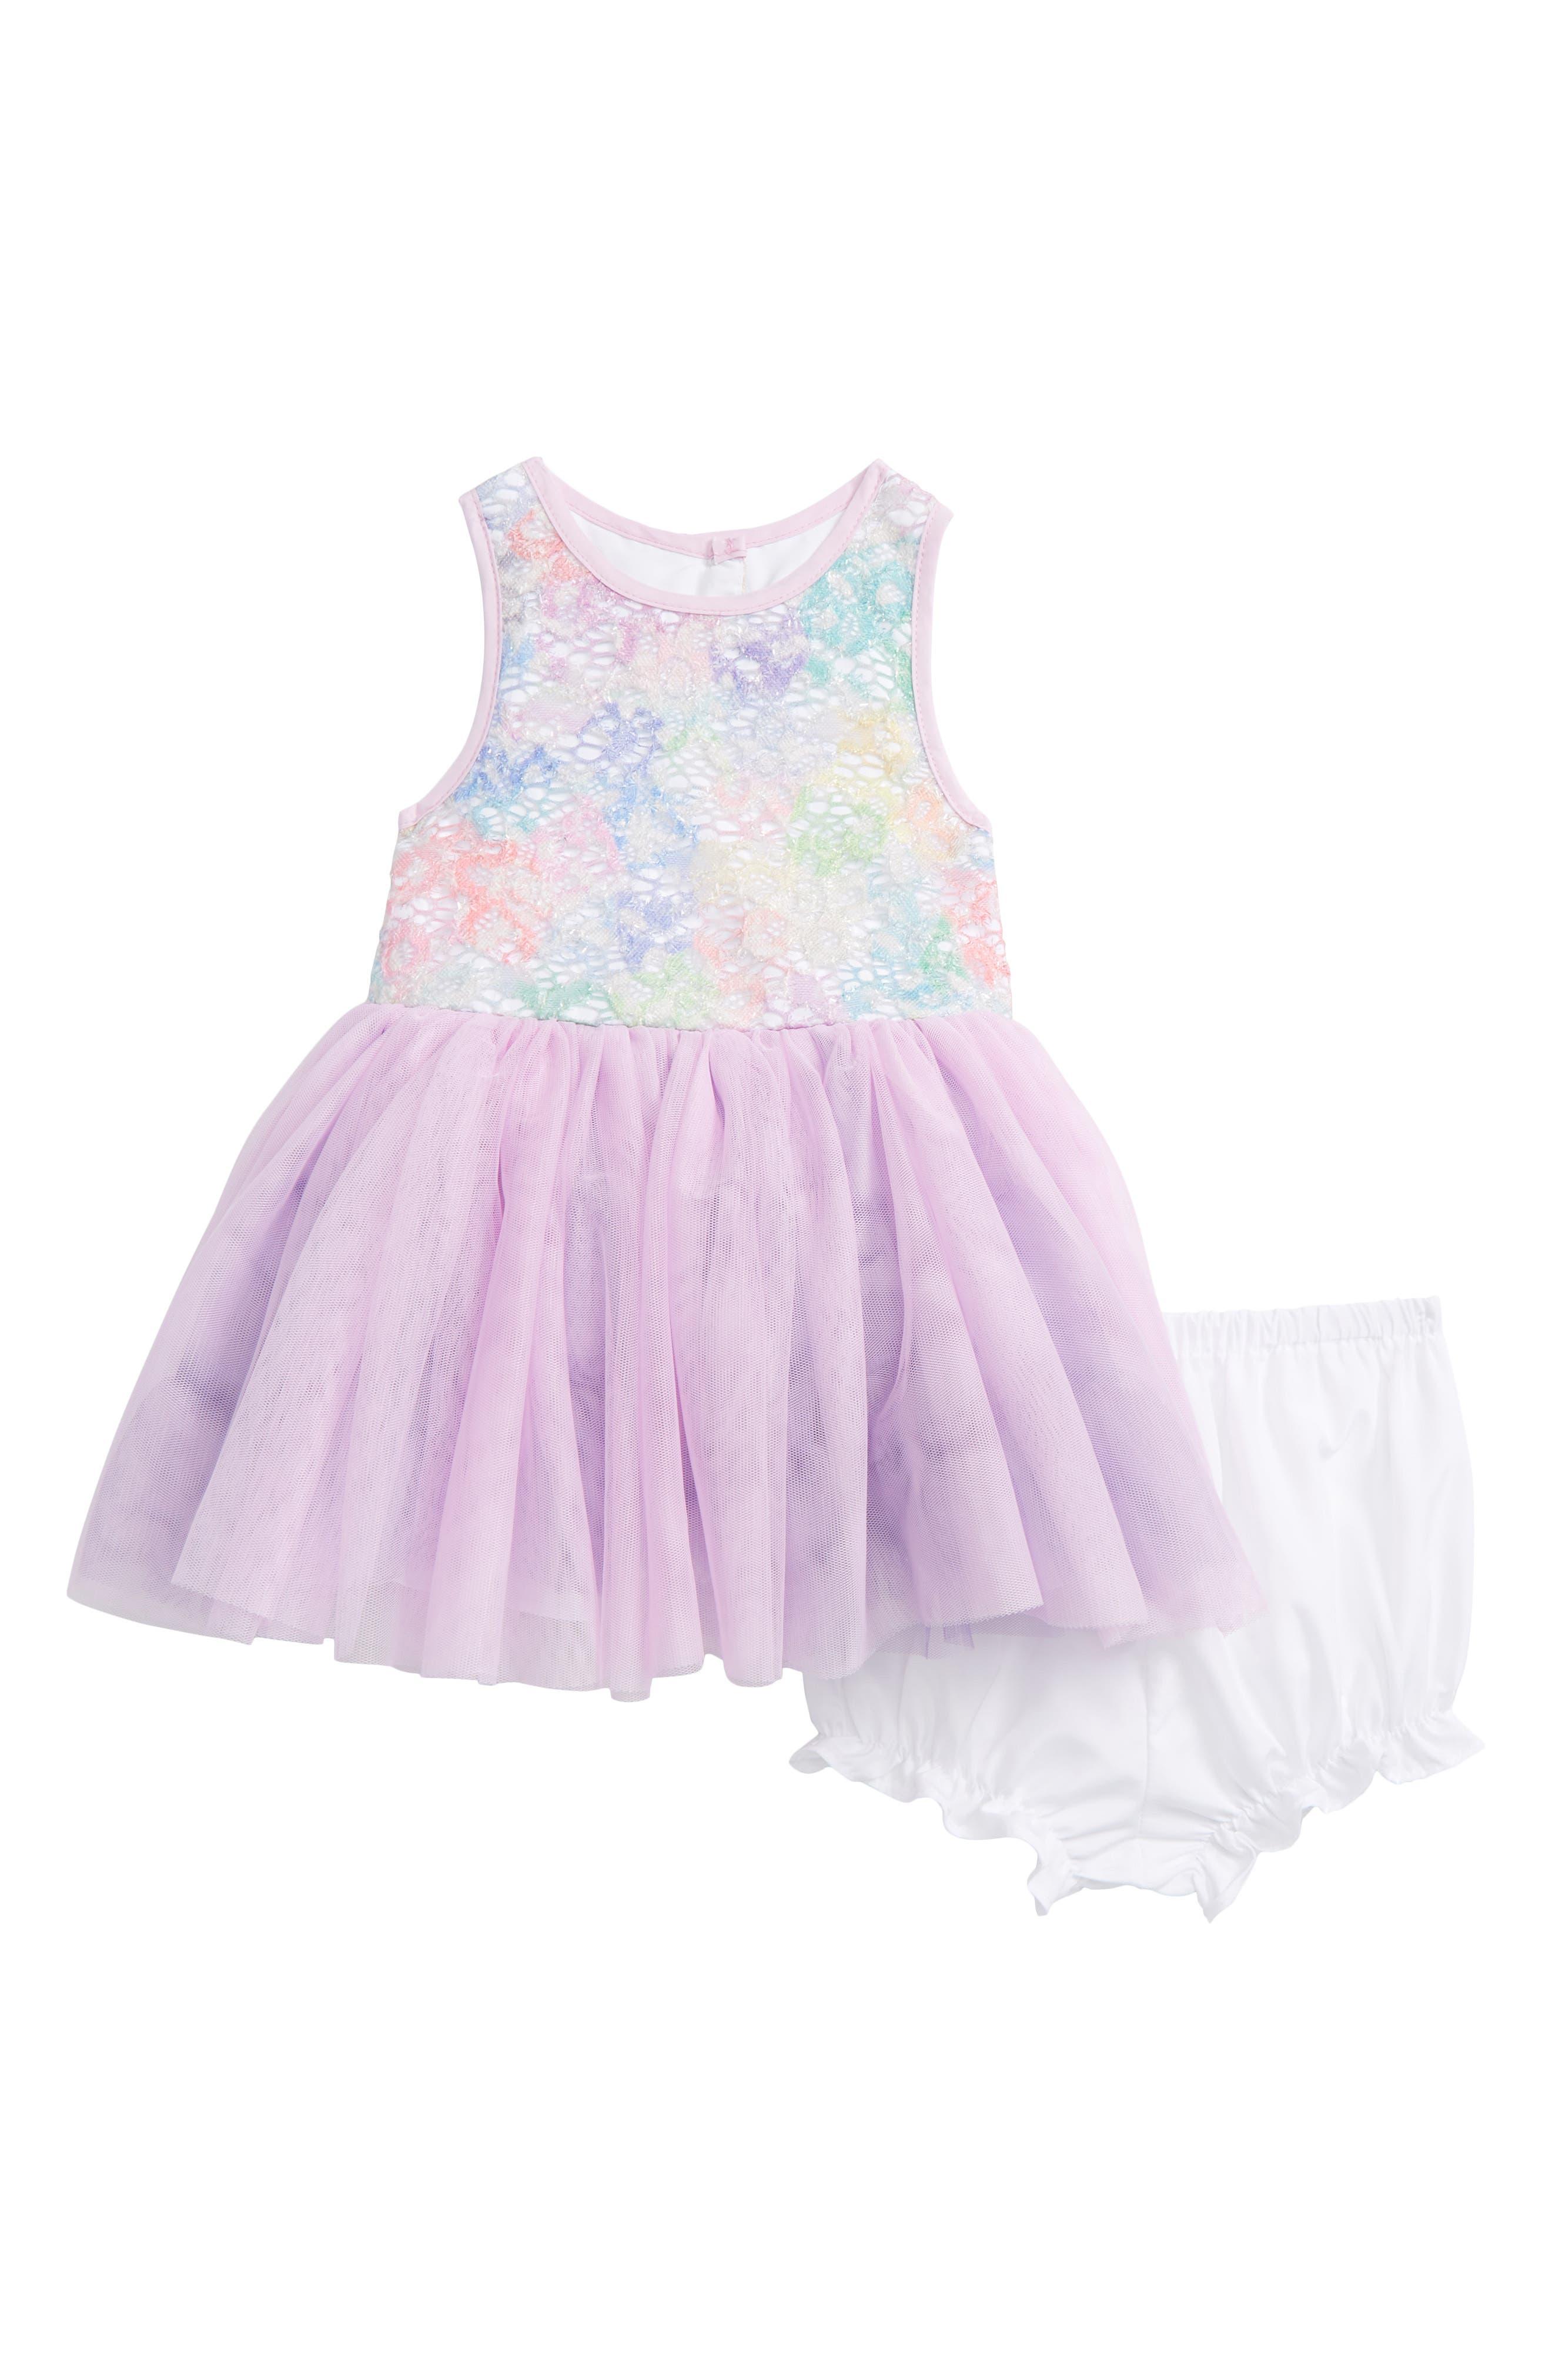 Alternate Image 1 Selected - Pippa & Julie Rainbow Tutu Dress (Baby Girls)